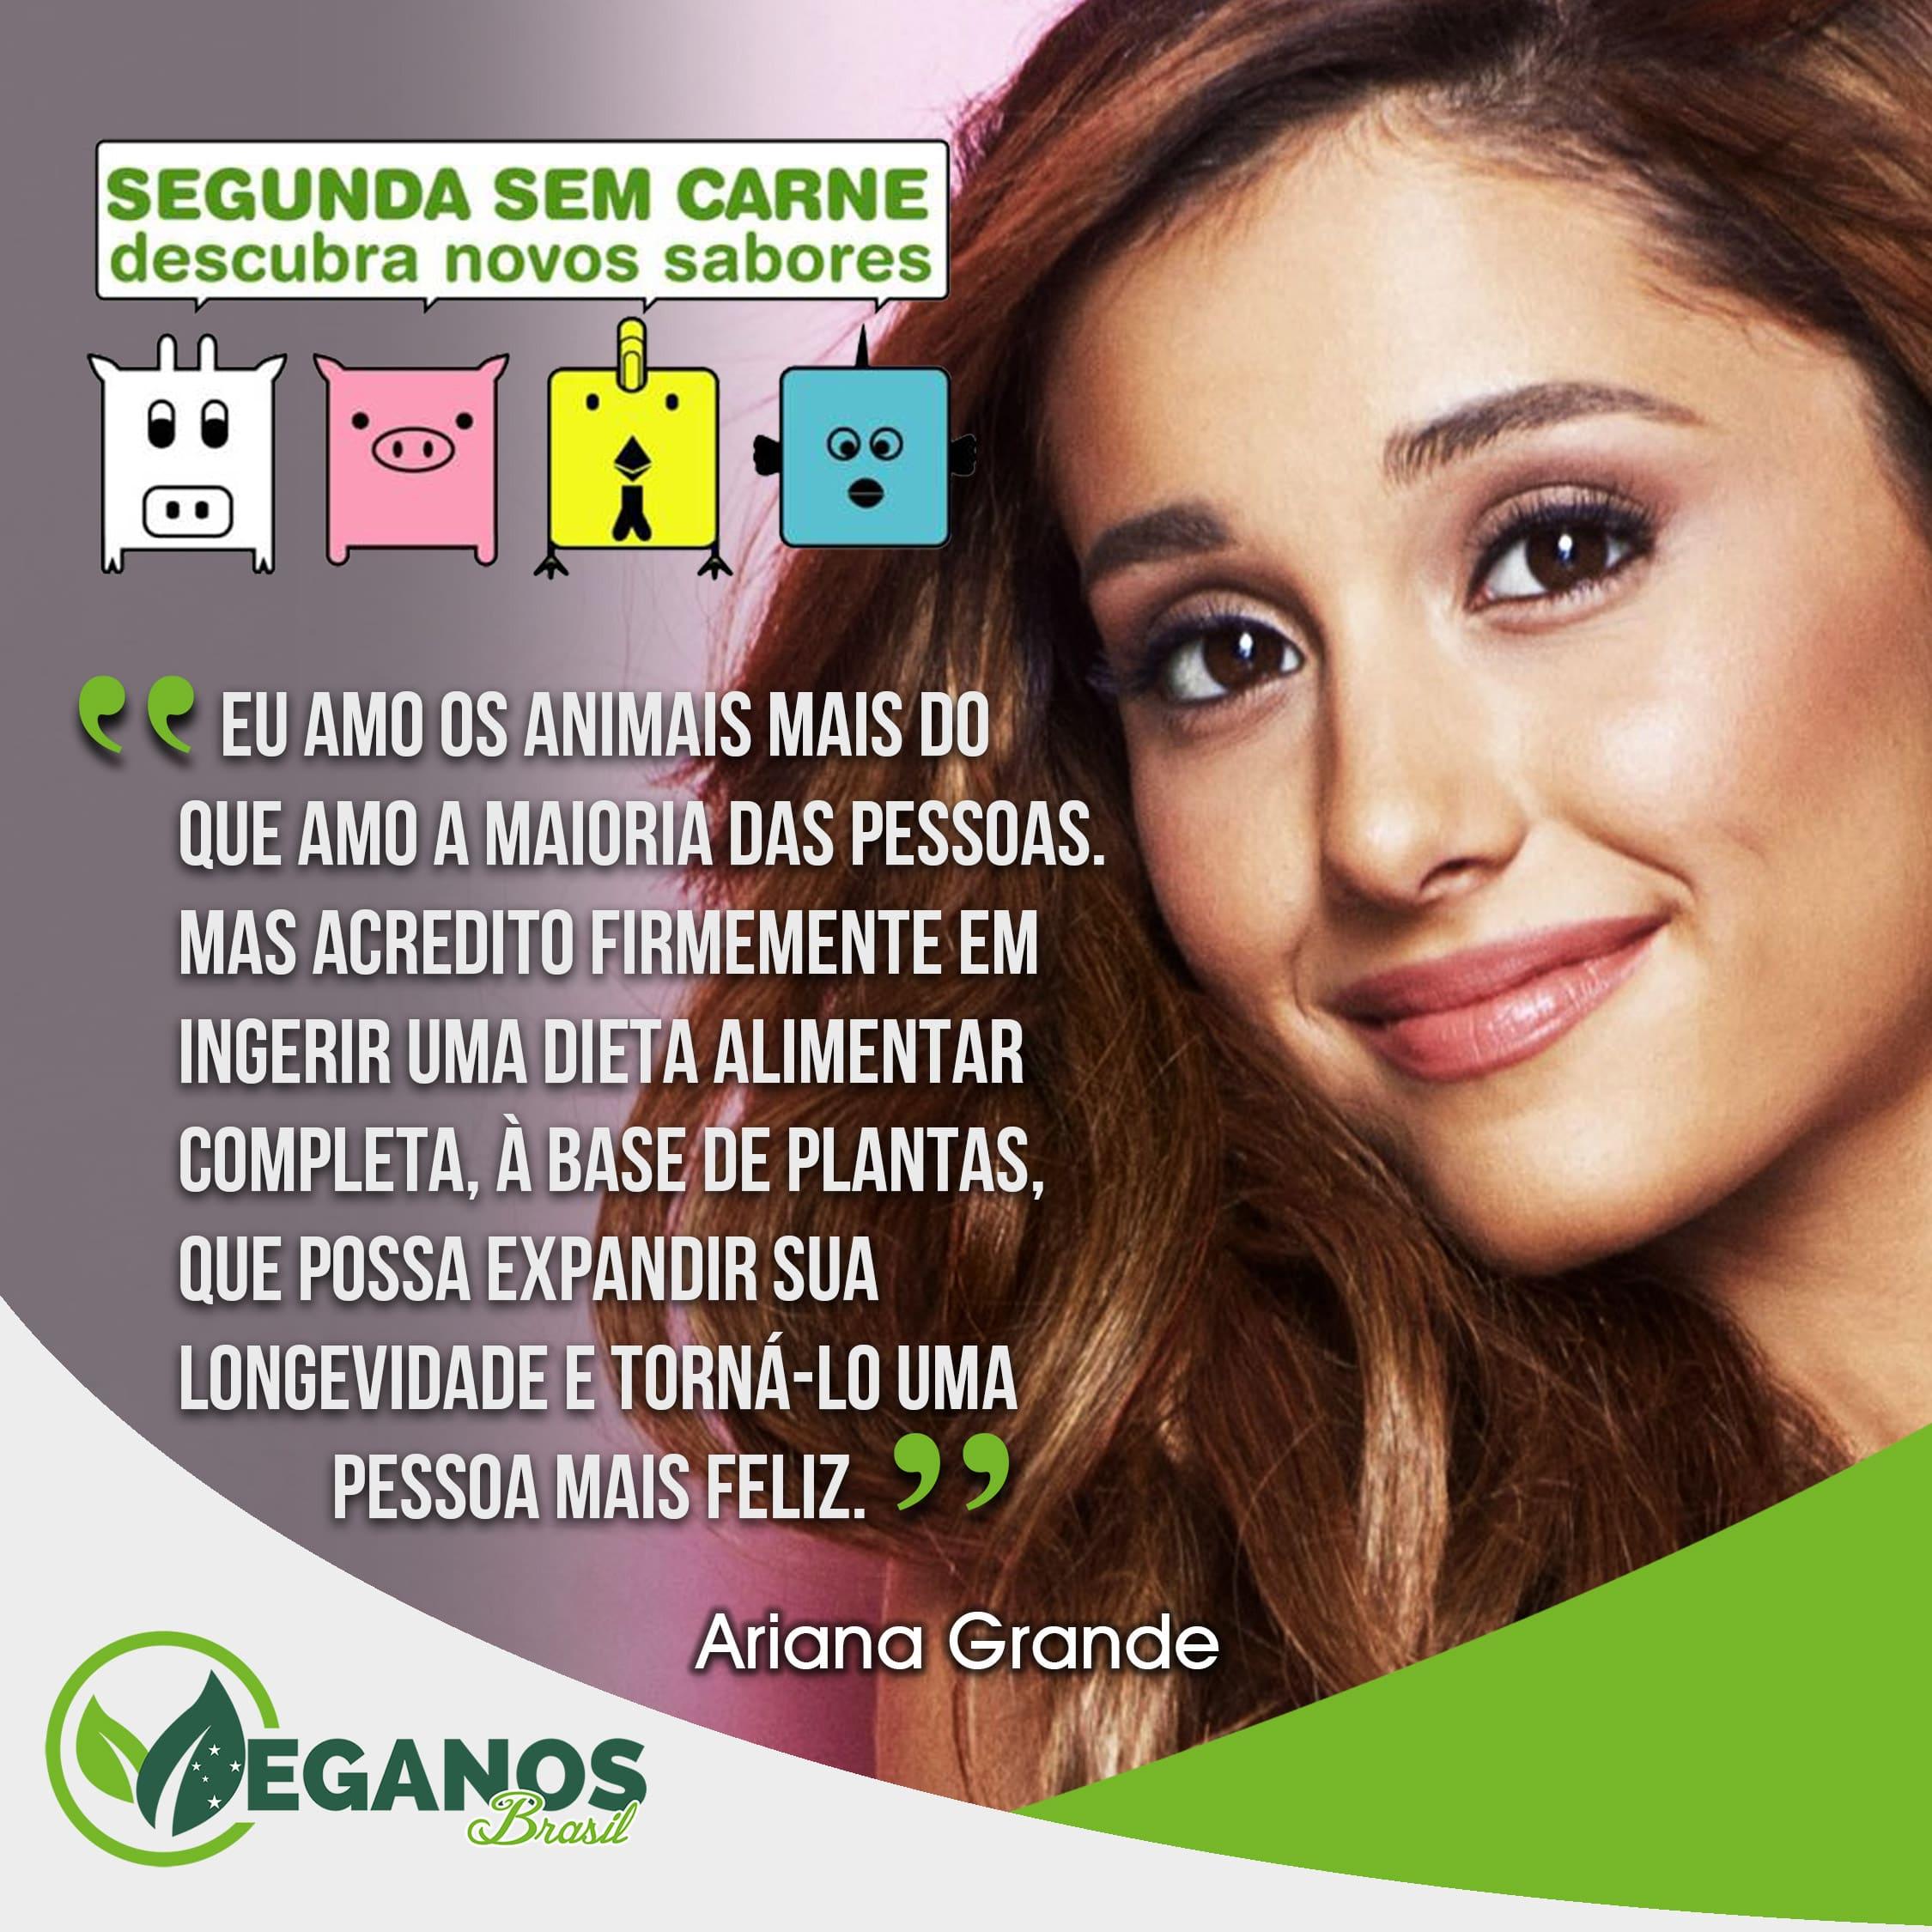 Post_Instagram_SEGUNDASEMCARNE_Ariana-Grande